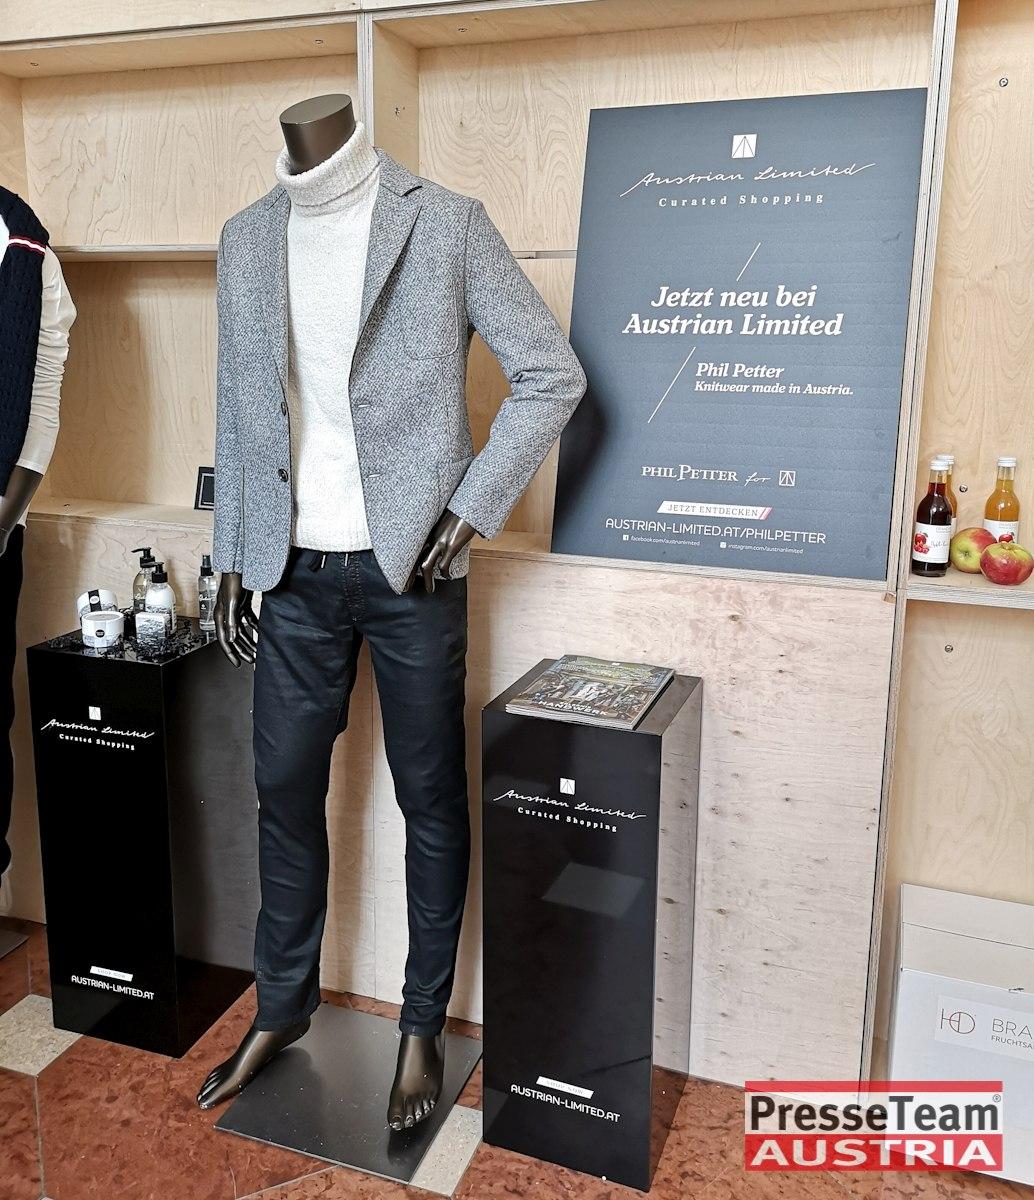 Messe Hofburg Wien 105 - Luxus Möbelmesse & Lifestyle in der Hofburg Wien